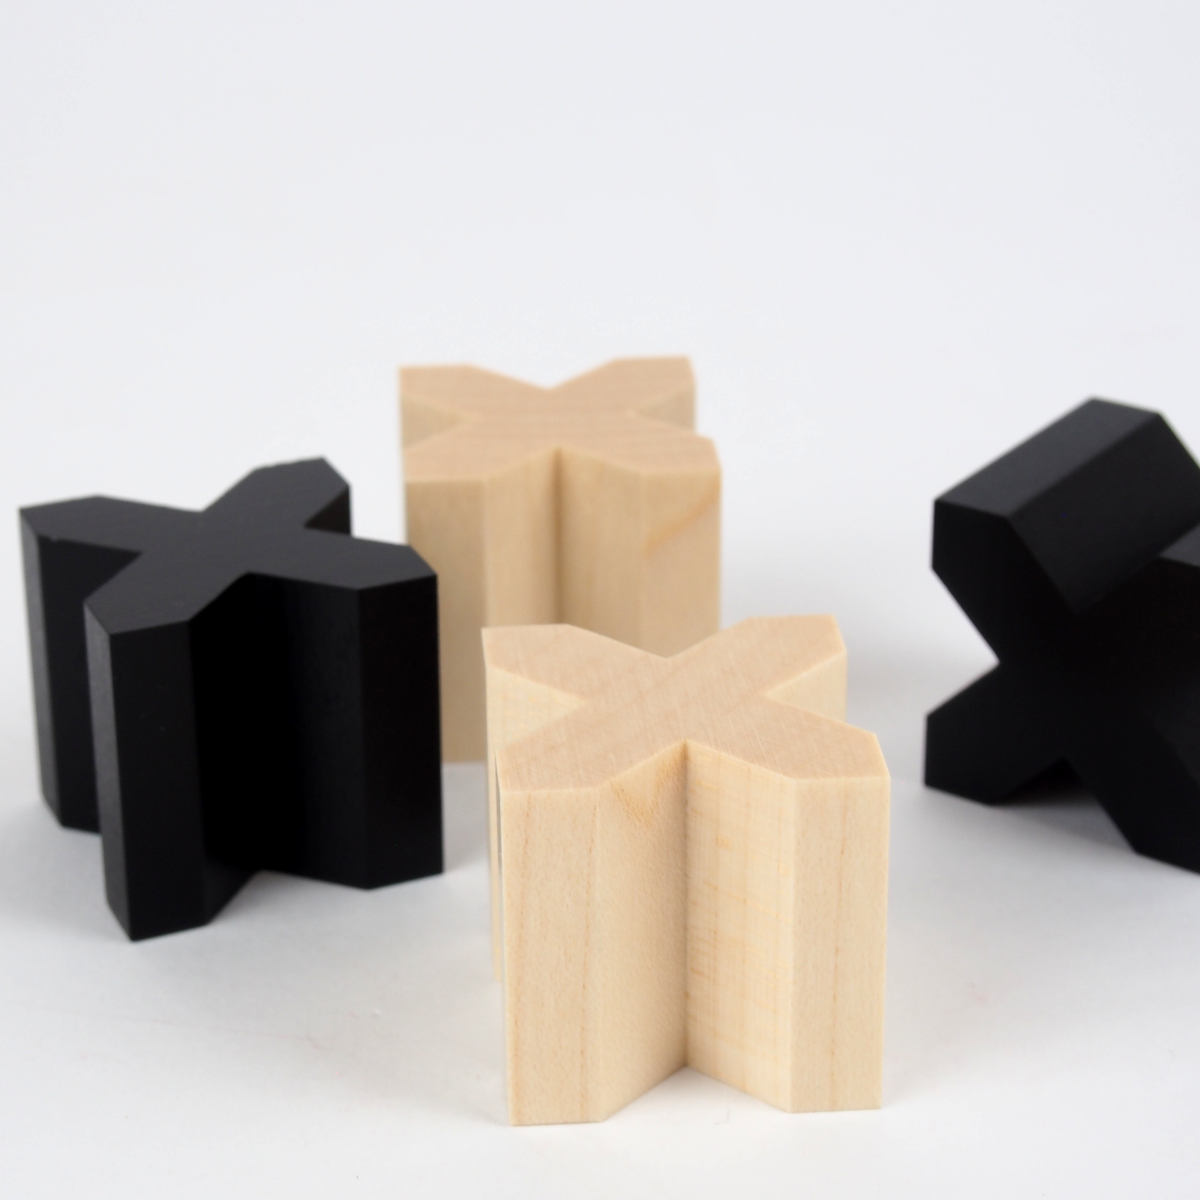 konstruktionsholz bauhaus